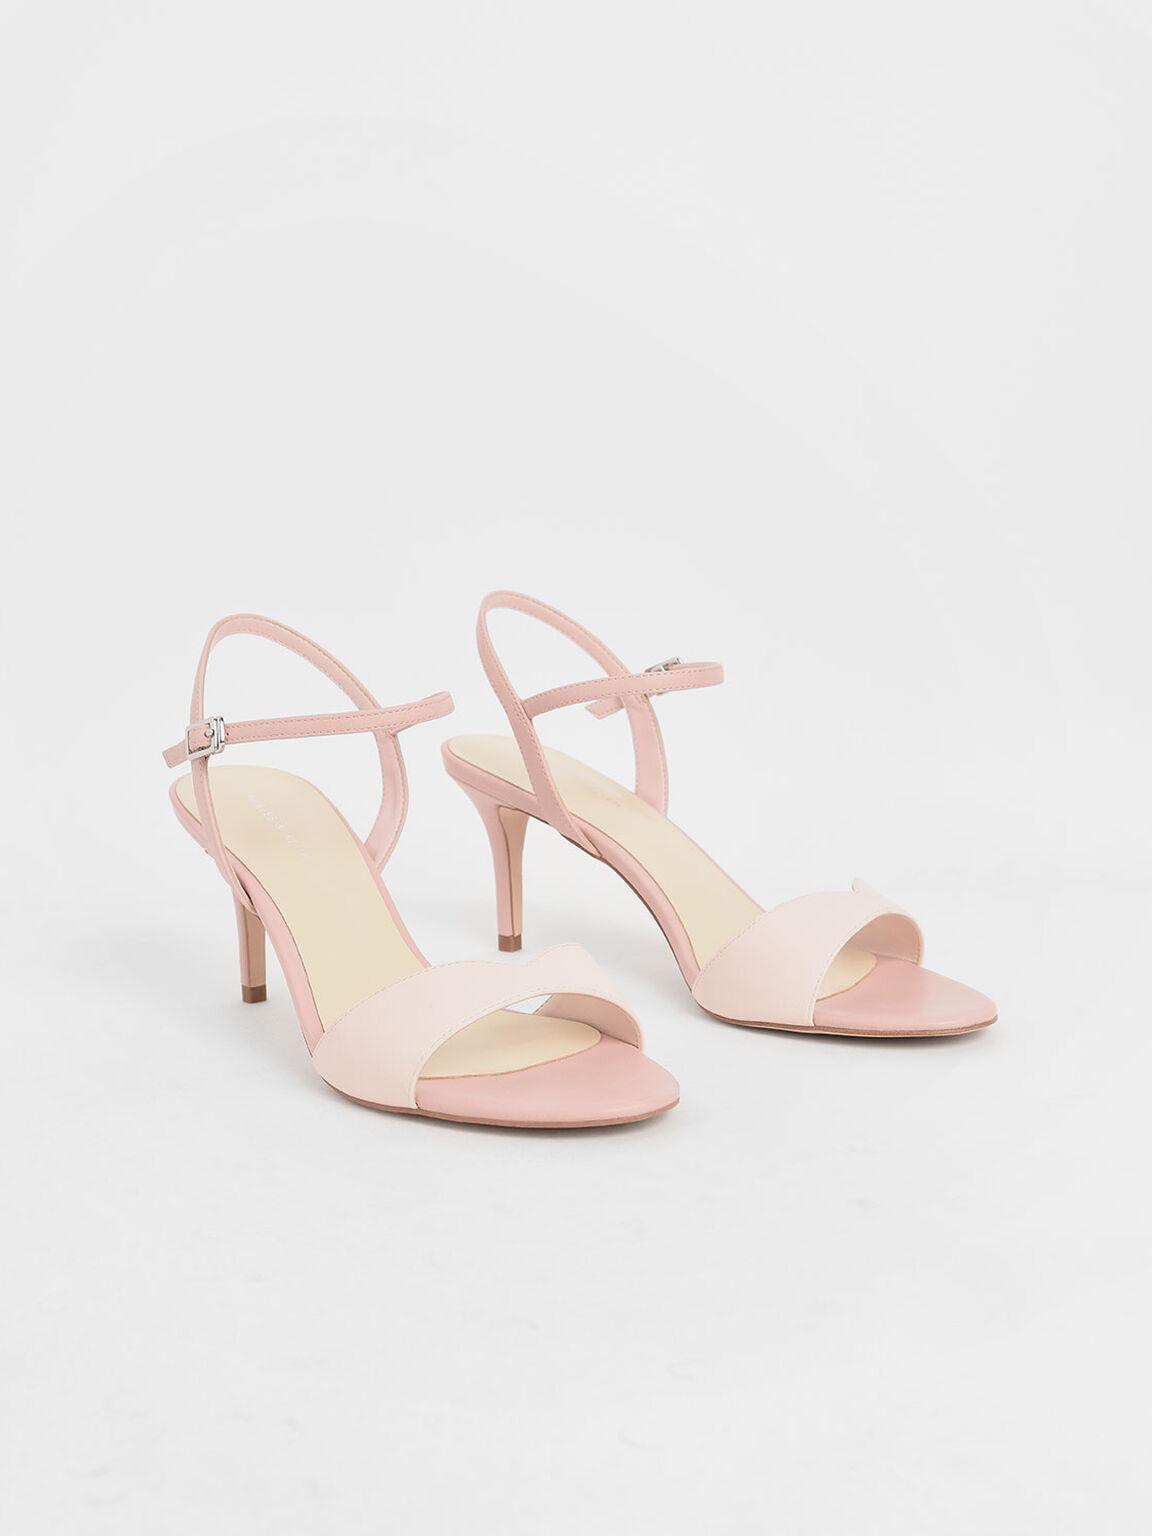 Sweetheart Topline Ankle Strap Heels, Pink, hi-res